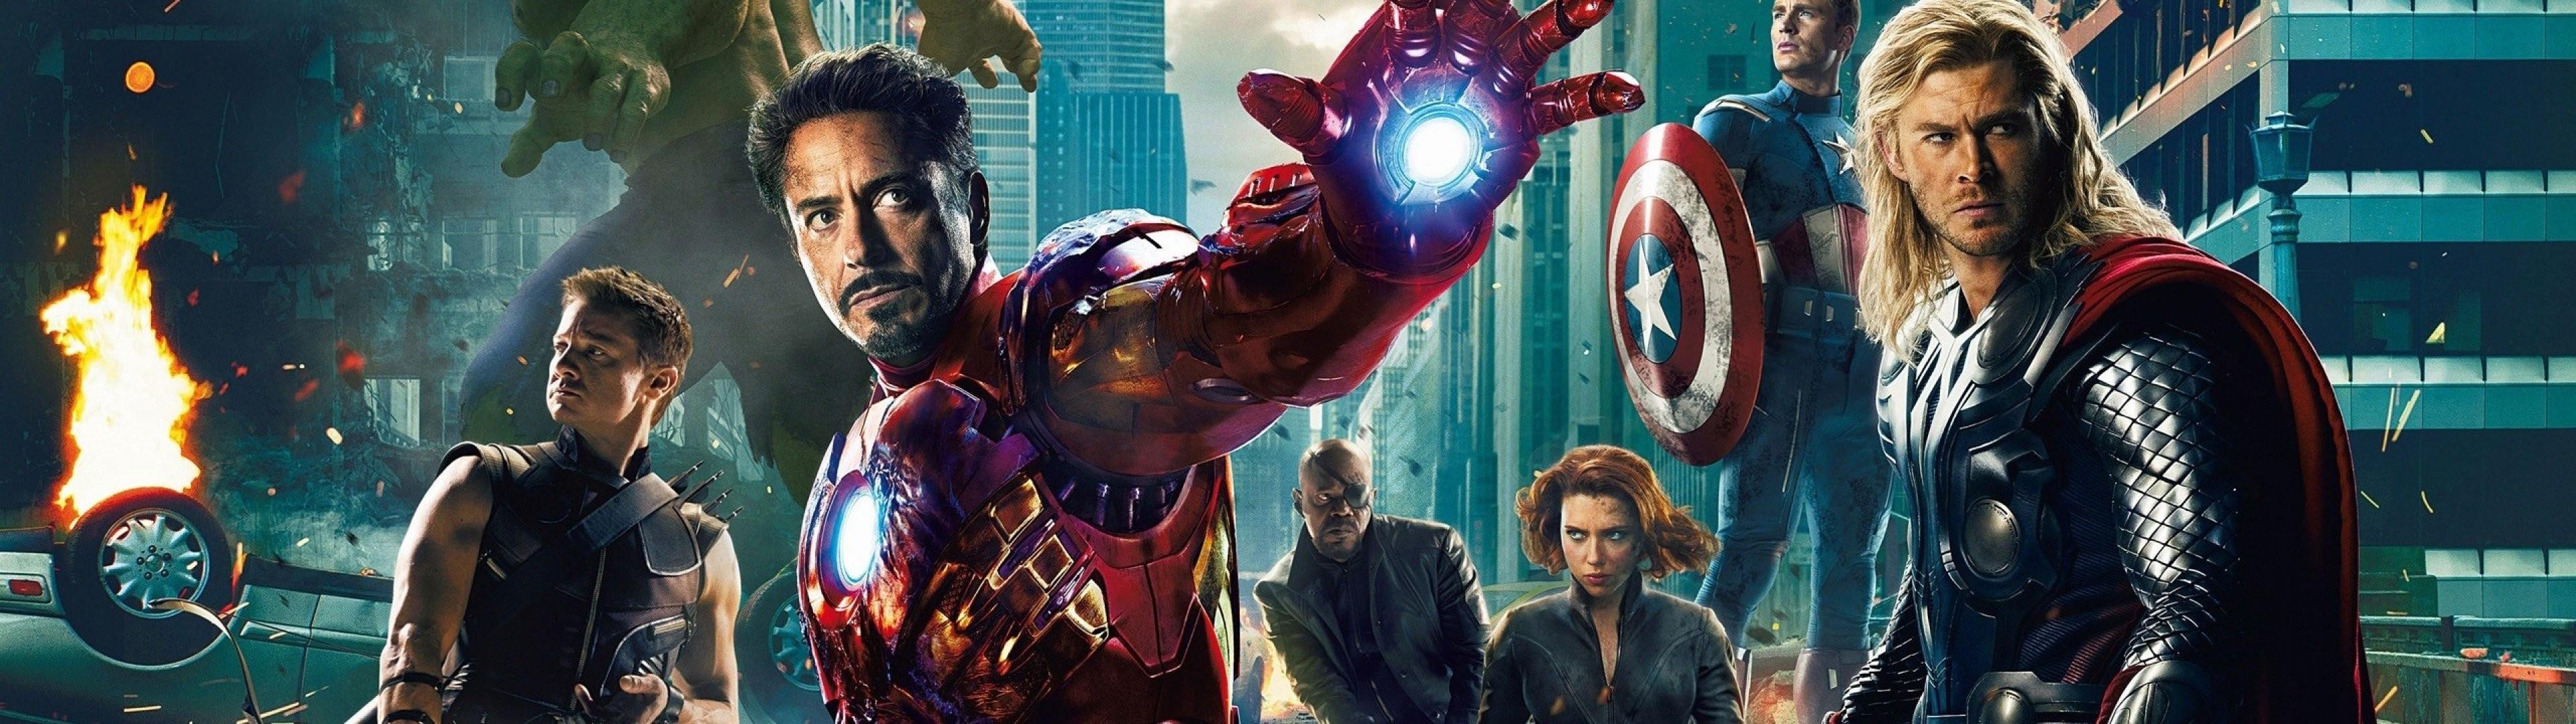 Scarlett Johansson Iron Man Thor Captain America dual screen Black .